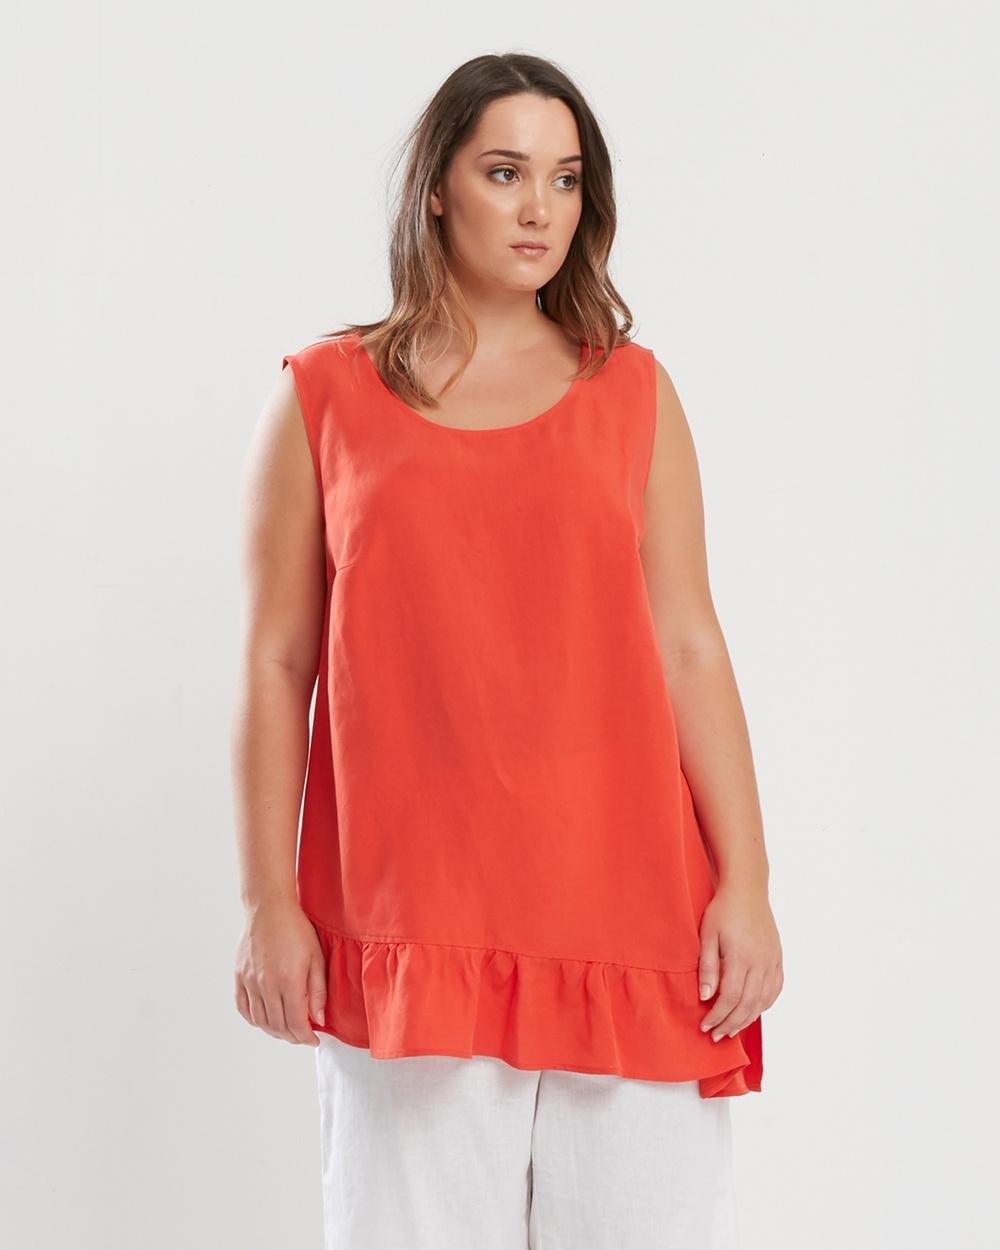 Advocado Plus Modest Sleeveless Tops Tangerine